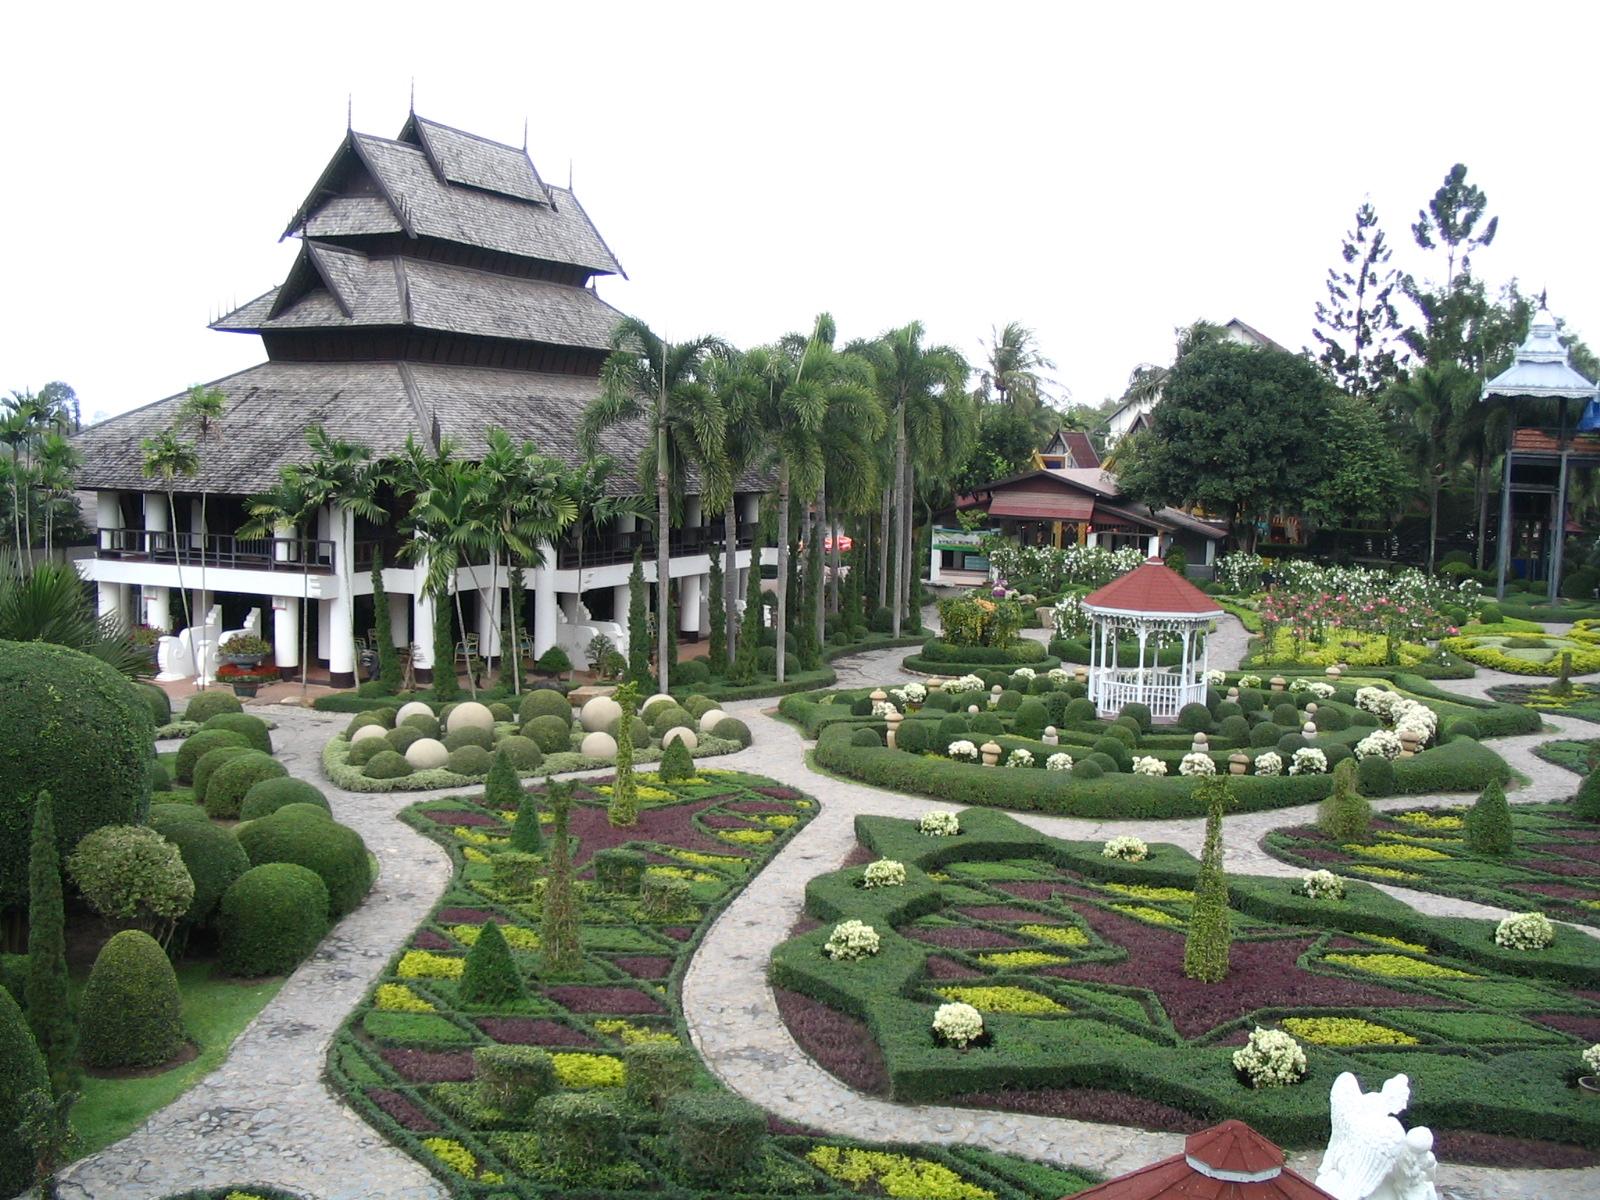 http://www.moisseenko.su/photo/Cambodia-Thai/Nooch/IMG_4869.JPG